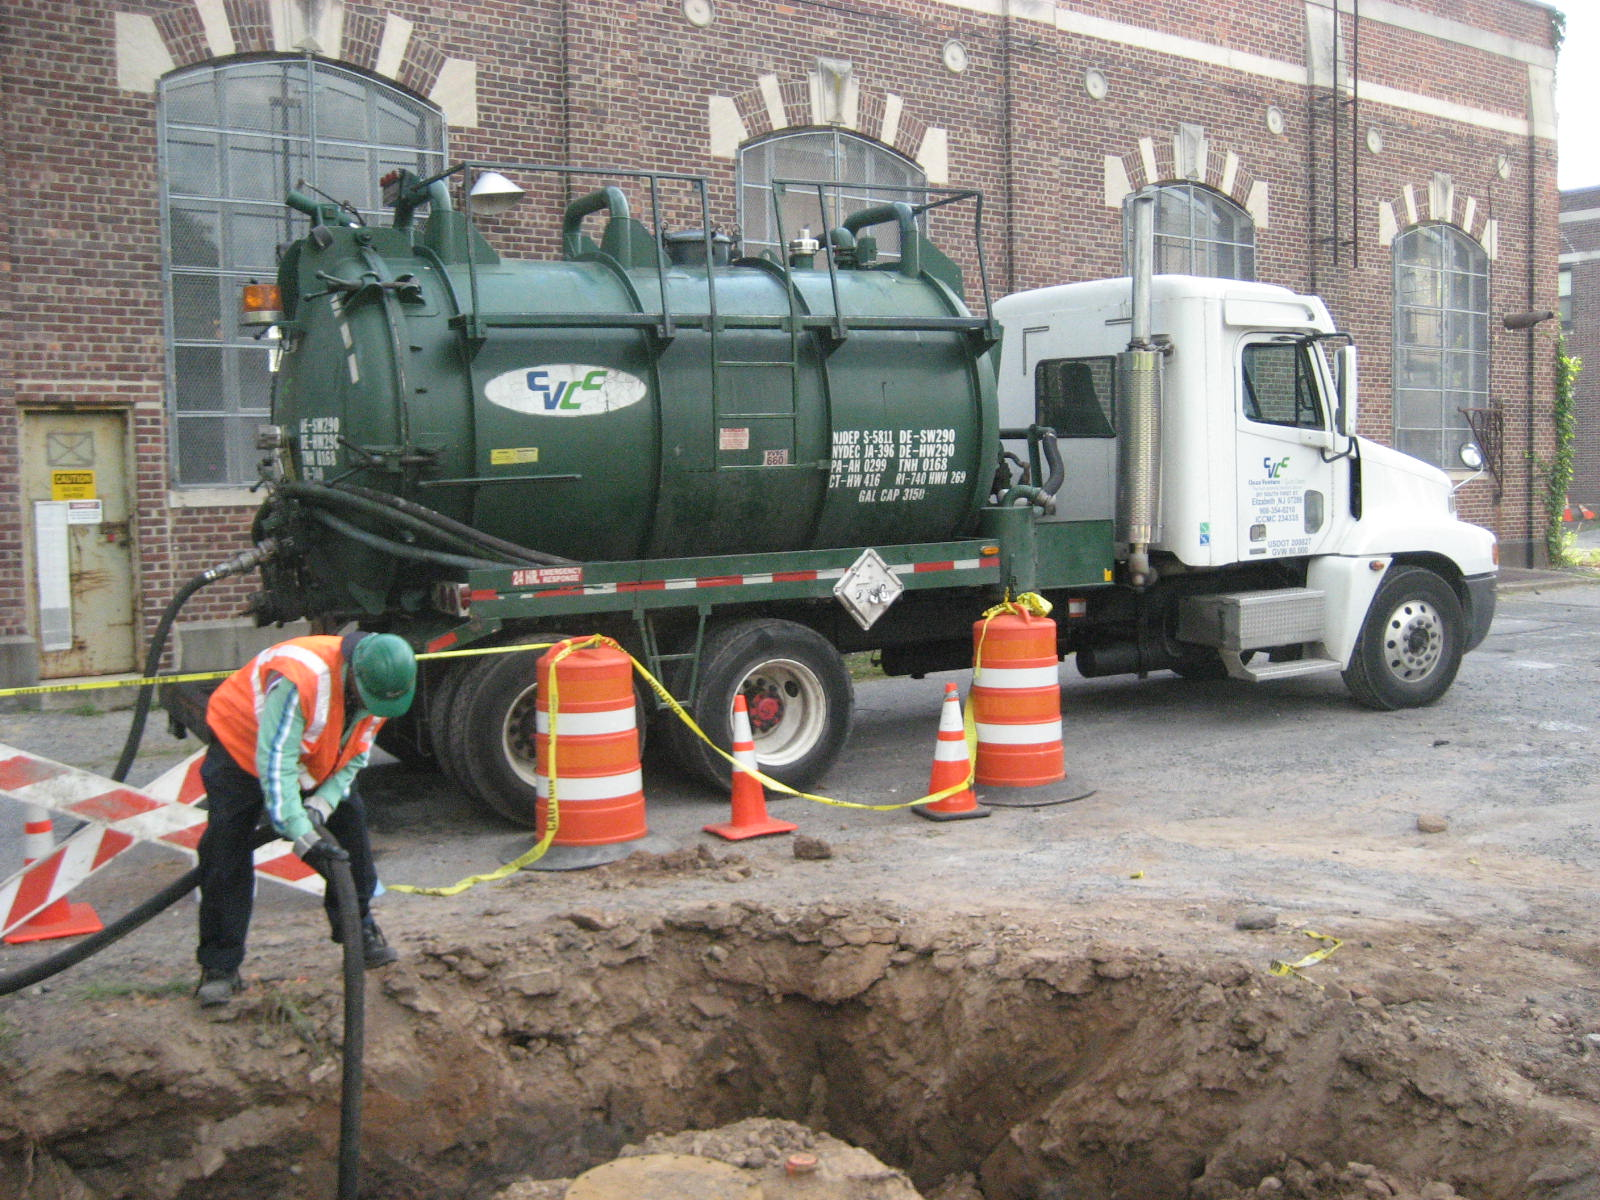 Tightness Test being performed on Underground Storage Tank utilizing a vacuum truck